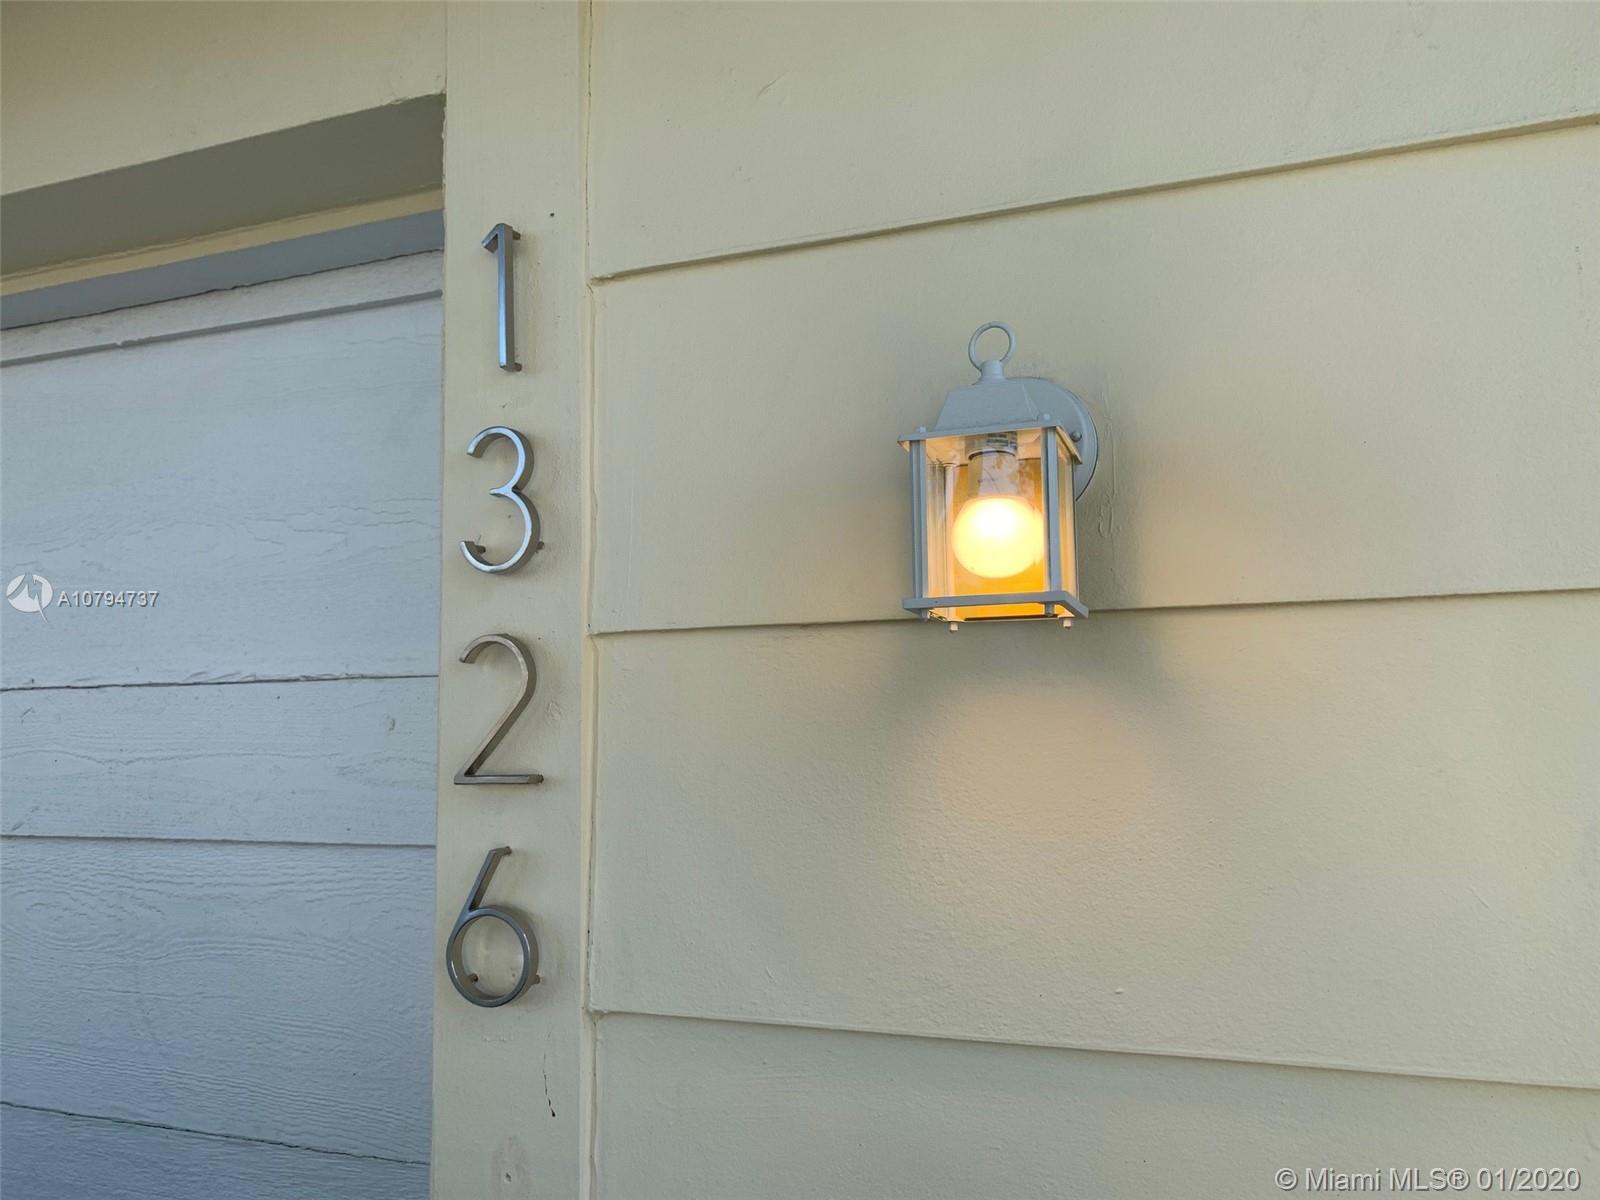 1326 N Quetzal Ct, Homestead, FL 33035 - Homestead, FL real estate listing